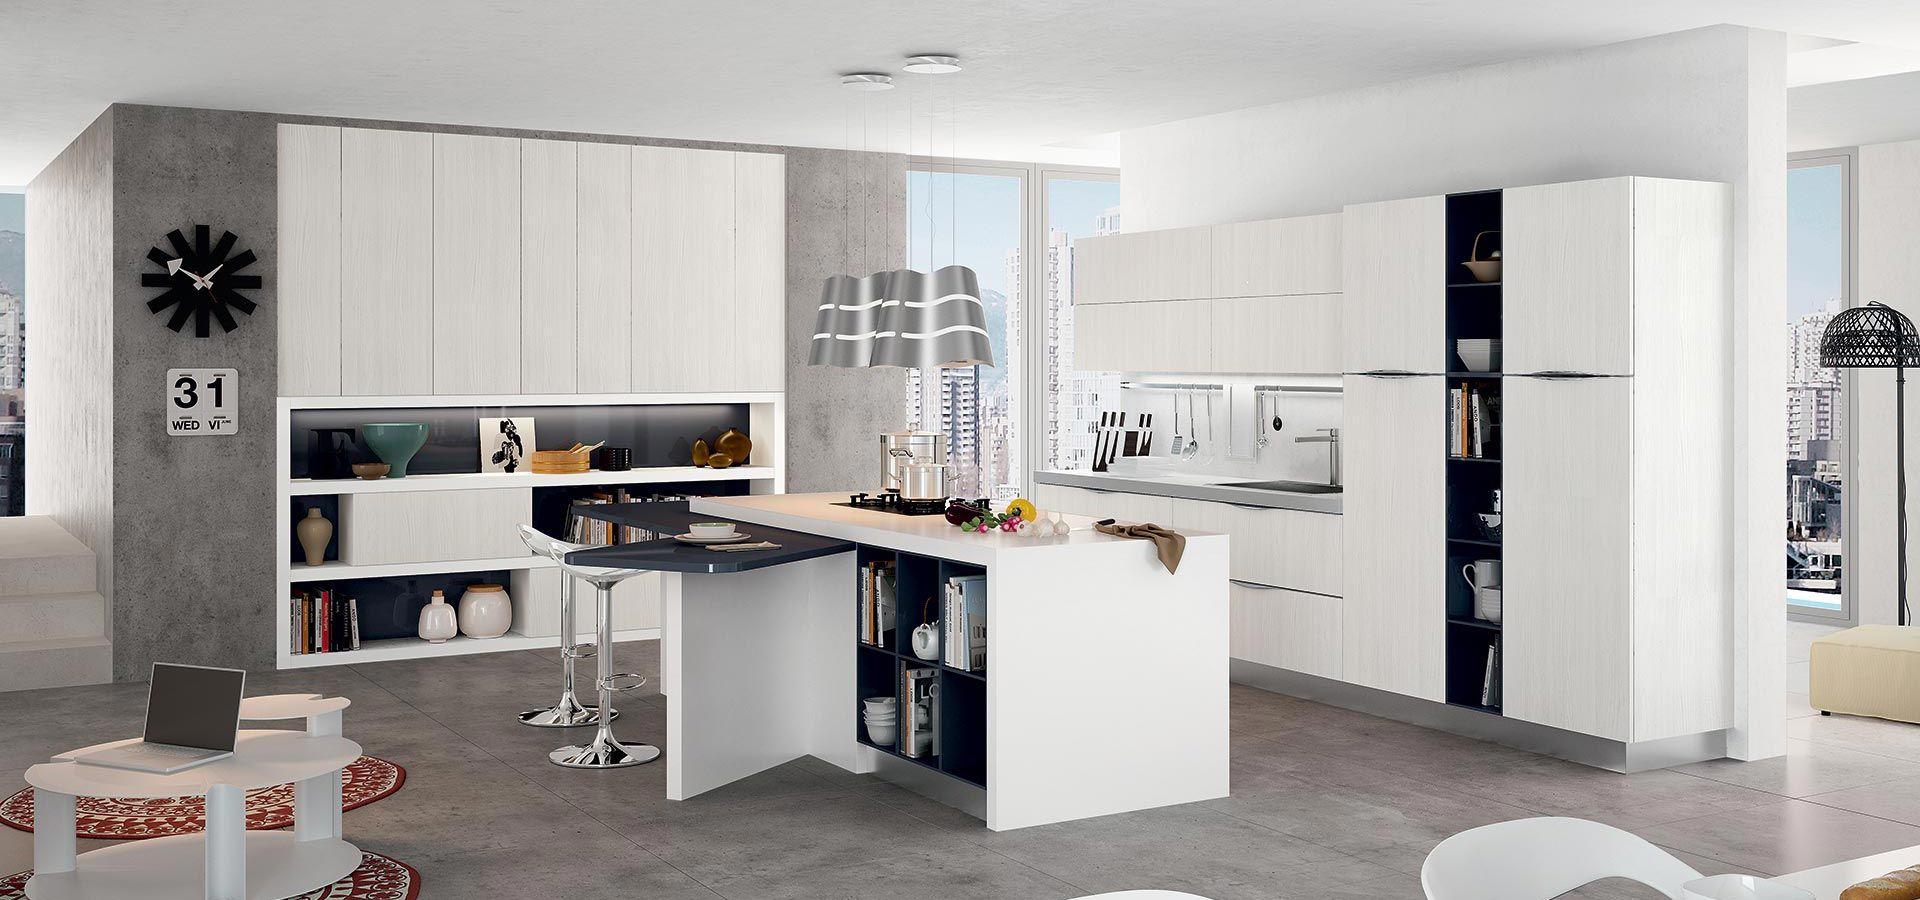 Cucina Moderna - Round Finitura nebbia | Vani a giorno polimerico ...